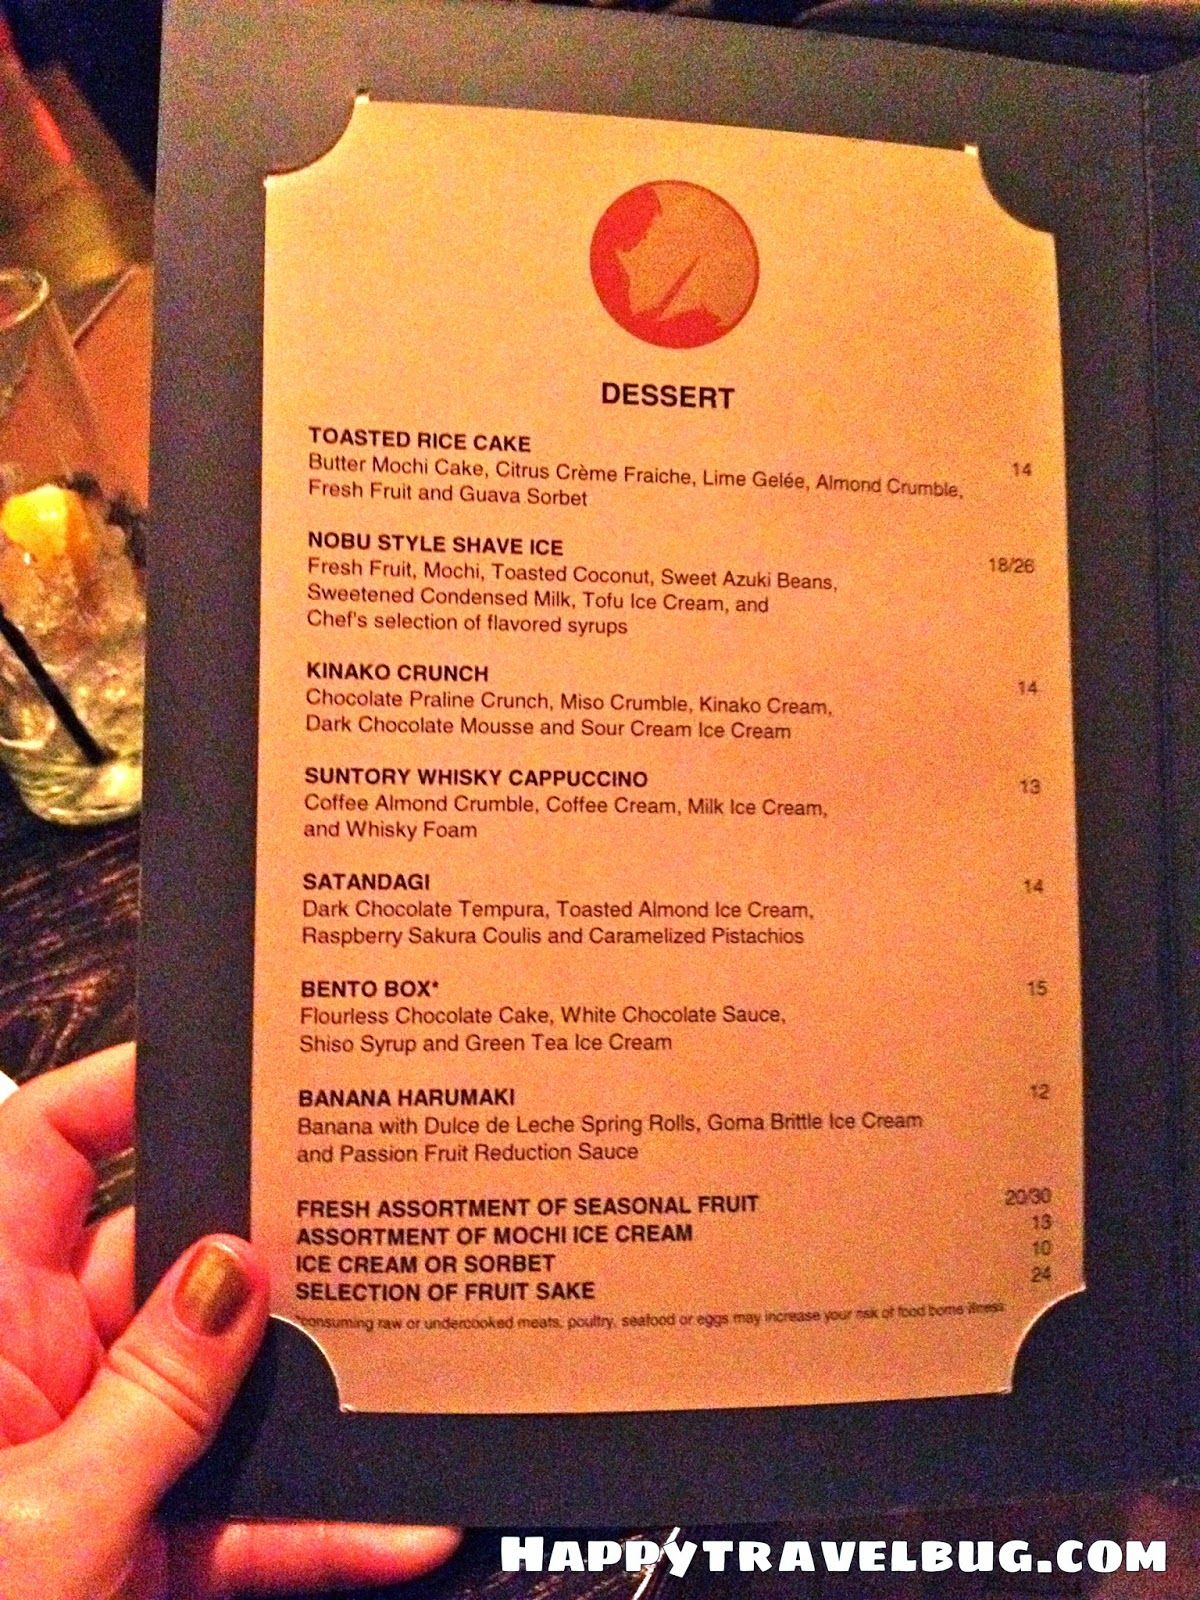 Dessert menu from Nobu restaurant in Las Vegas | Menus | Pinterest ...